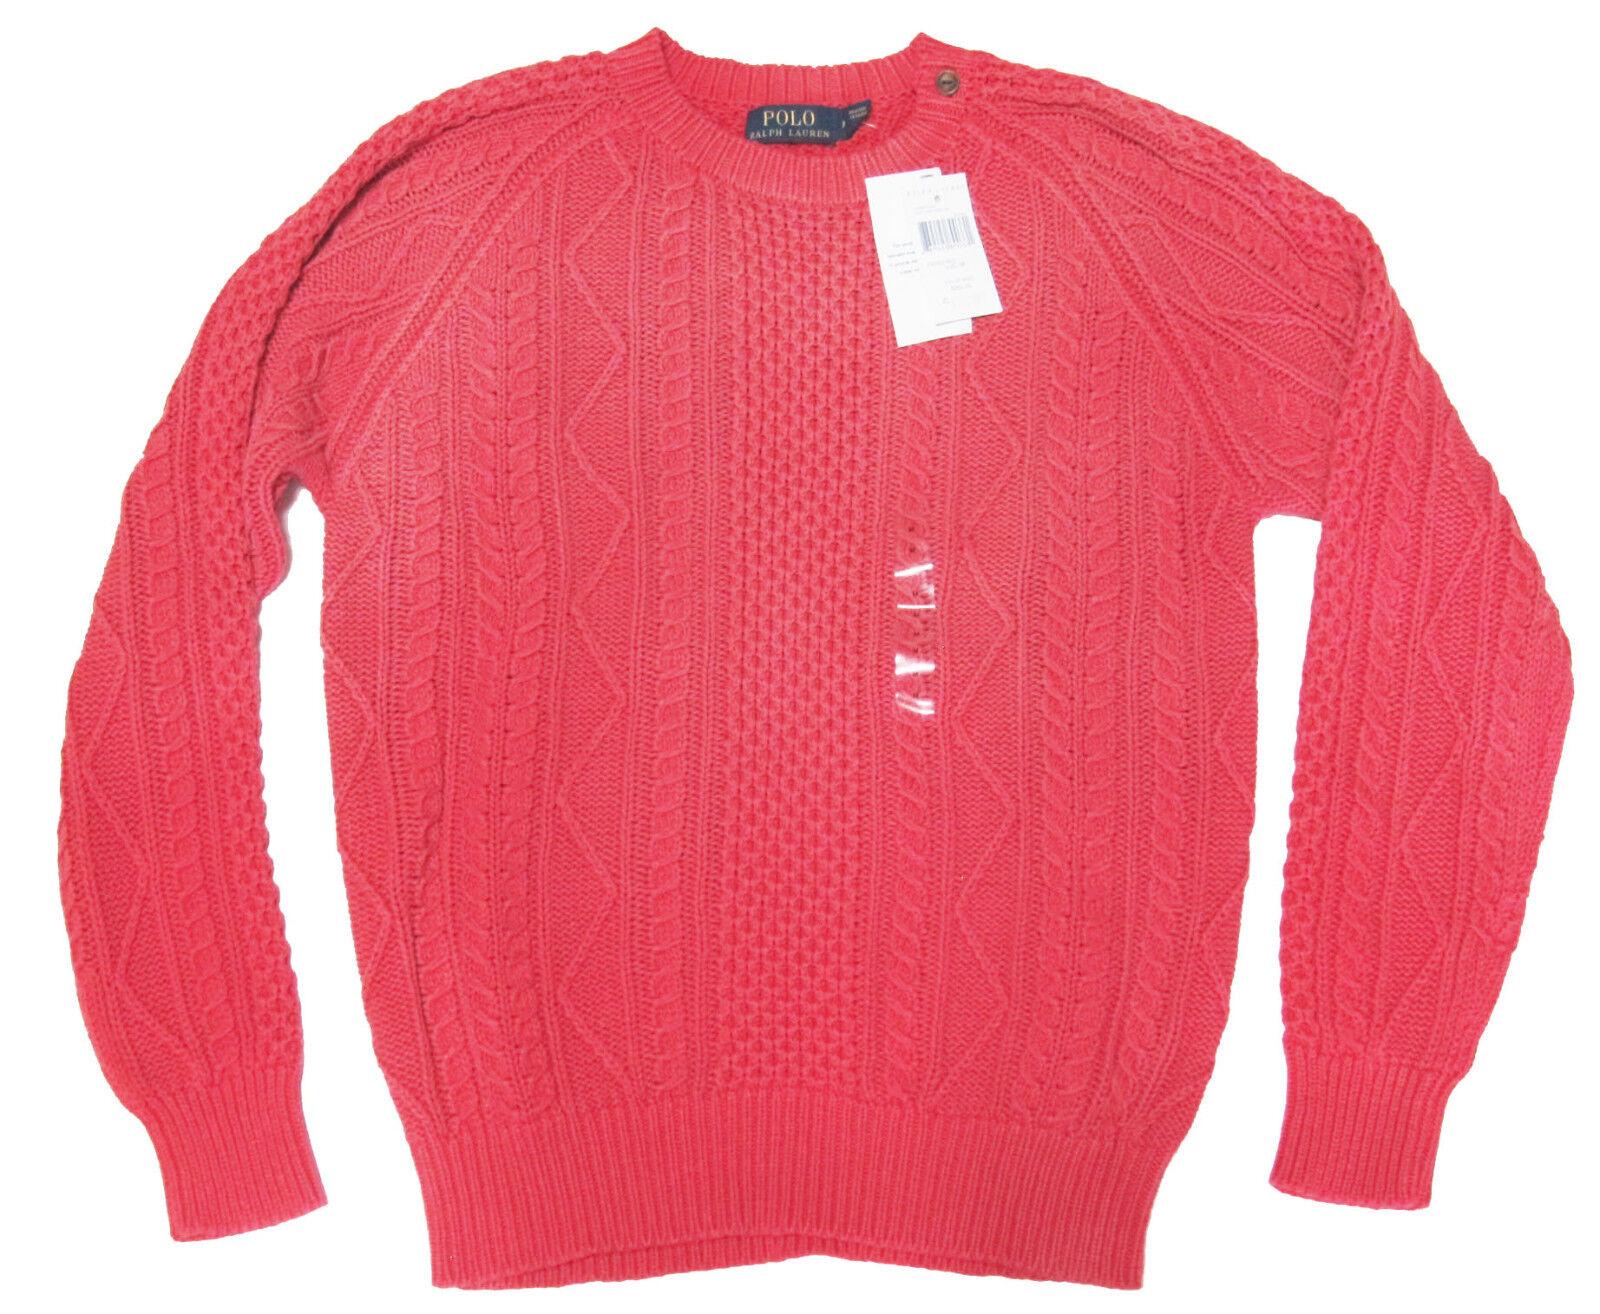 265 Polo Ralph Lauren herren Sun Faded rot Cable Knit Seafarer Sailing schweißer